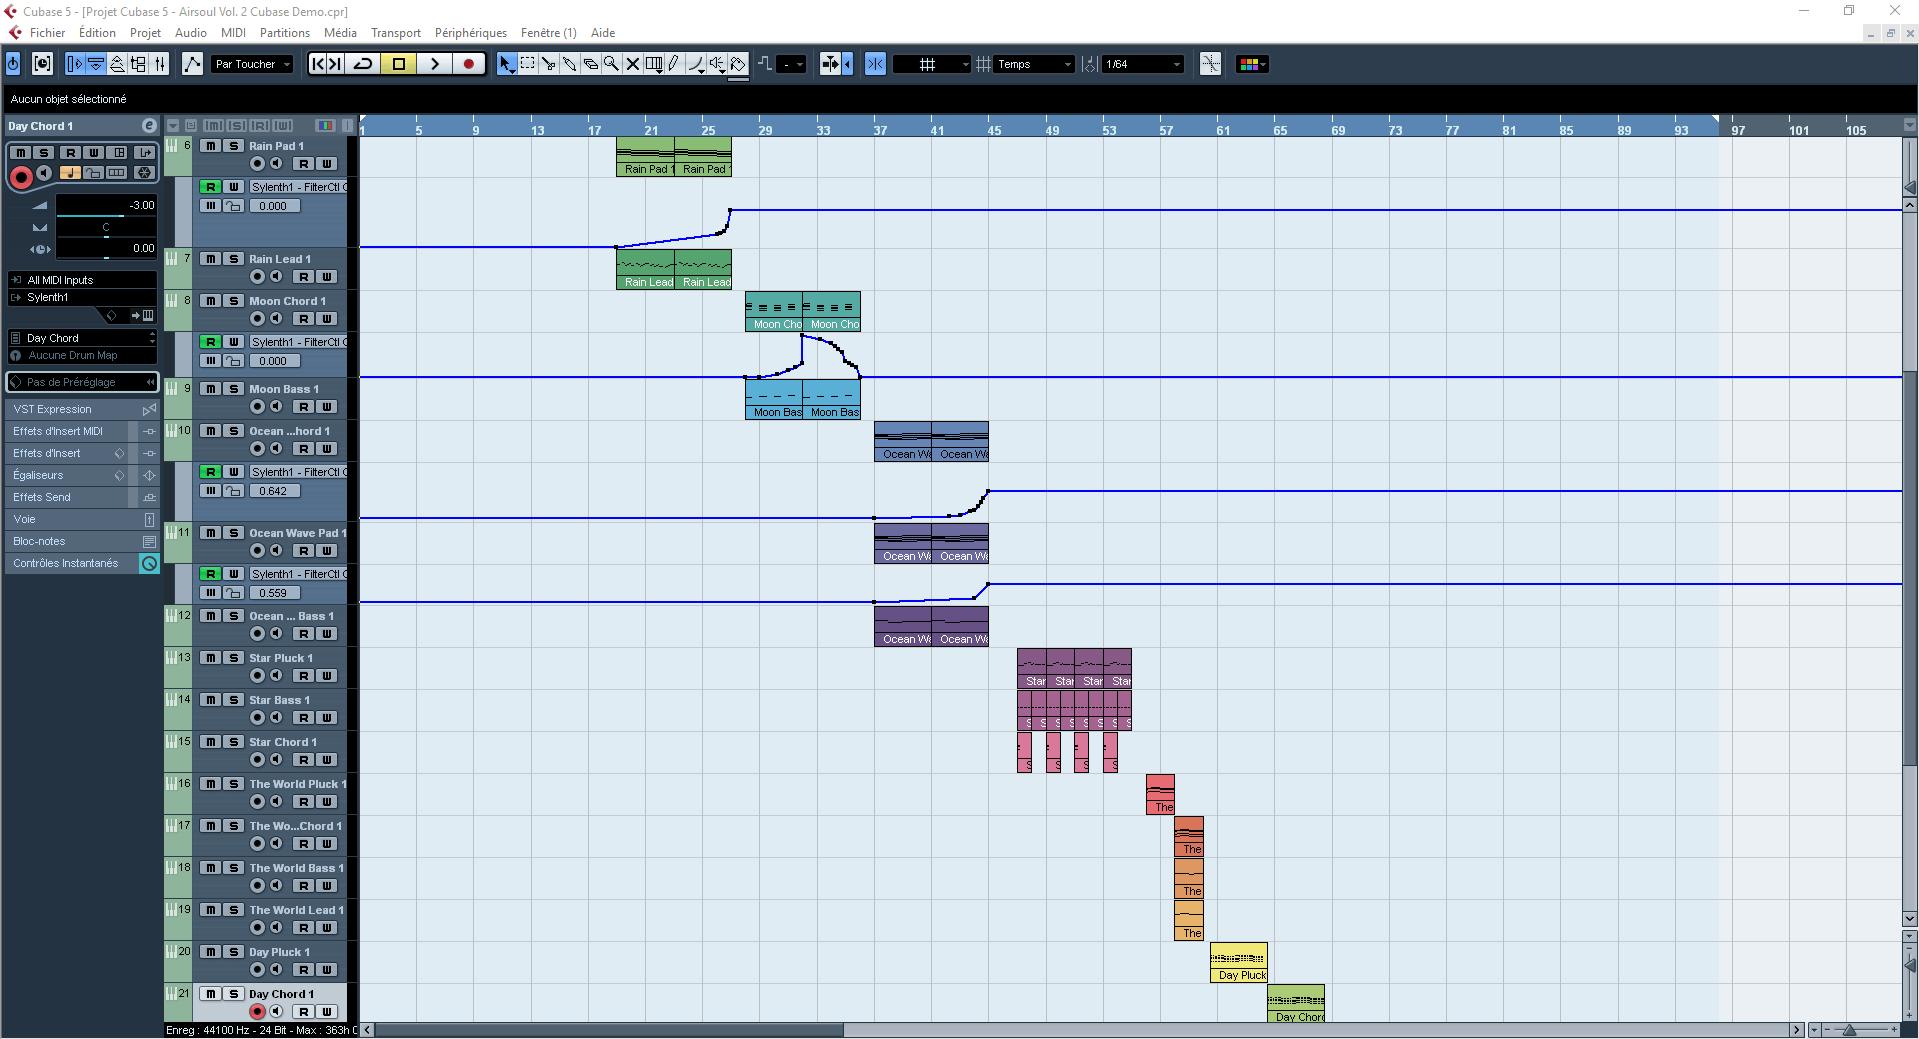 airsoul-vol-2-cubase-demo-soundset